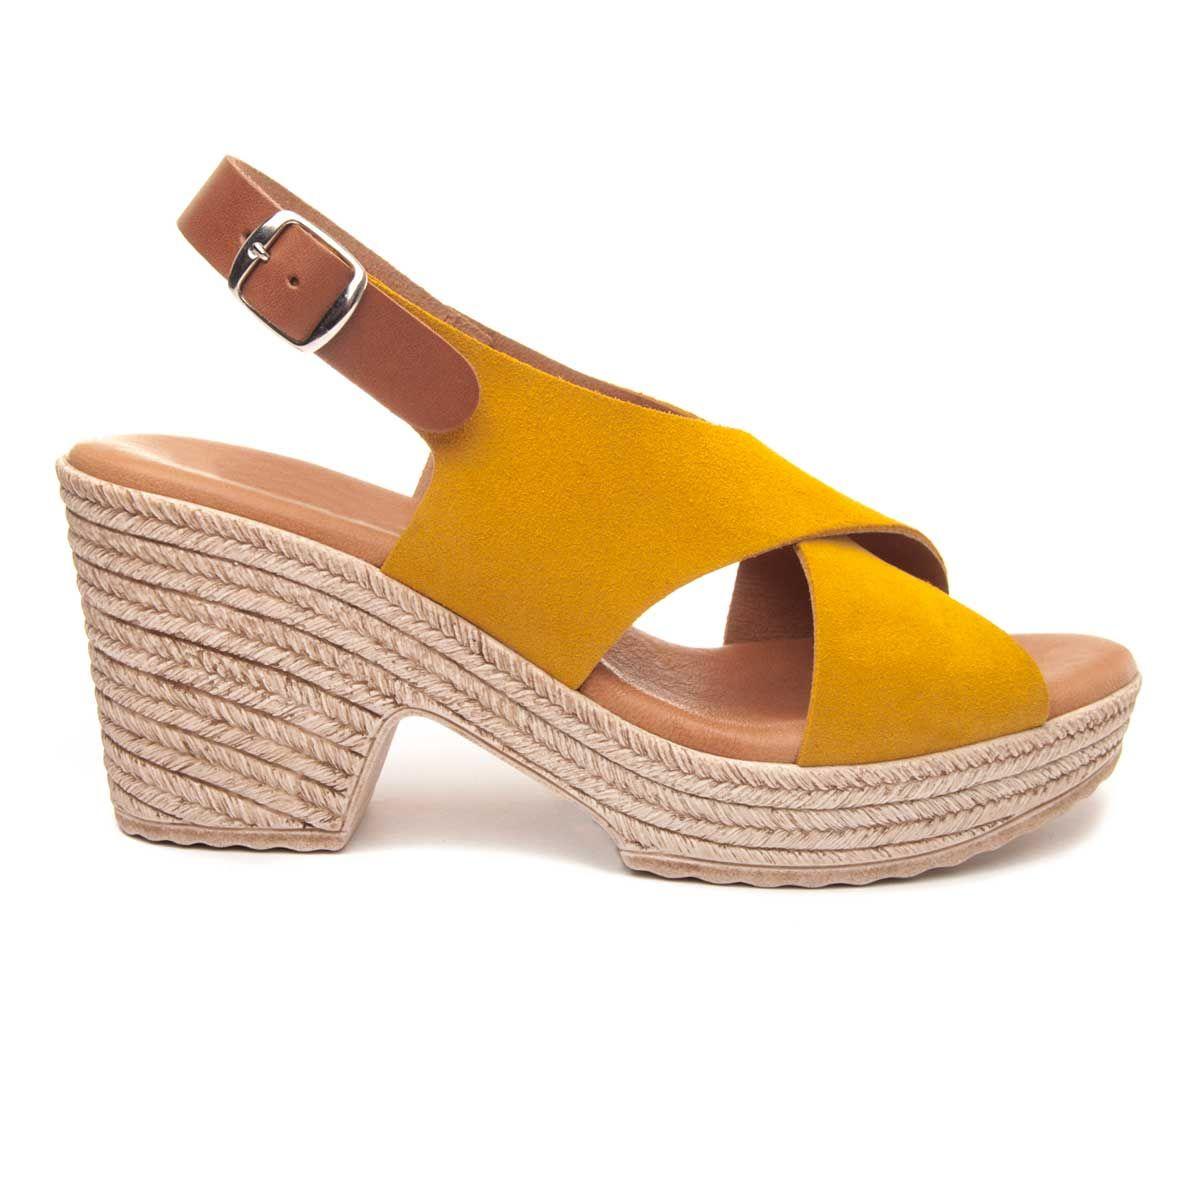 Purapiel Platform Sandal in Mustard